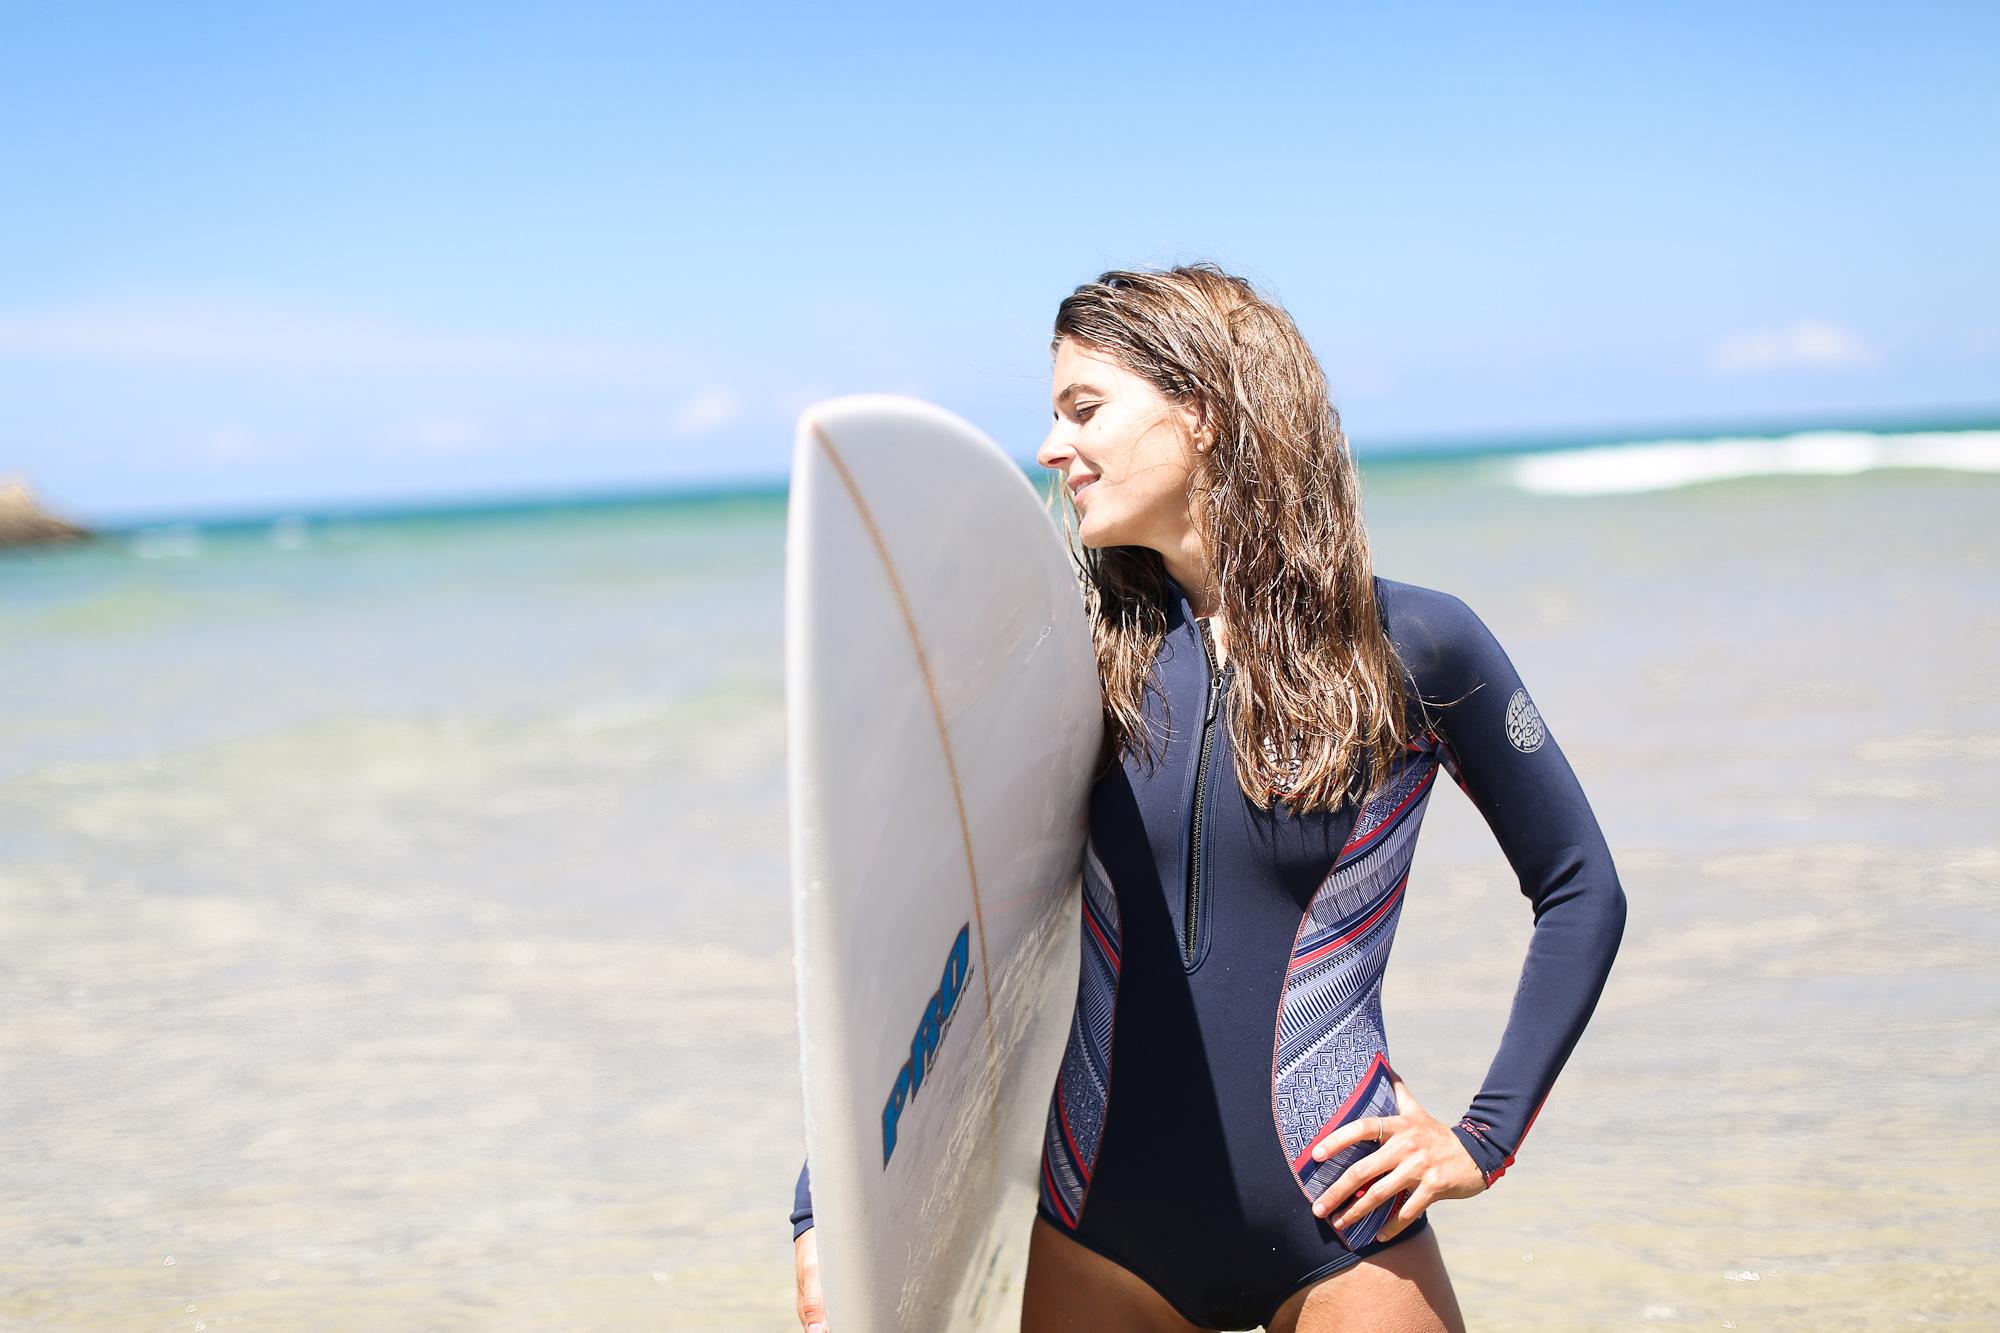 Clochet_surf_rip_curl_bombshell_wetsuit_3